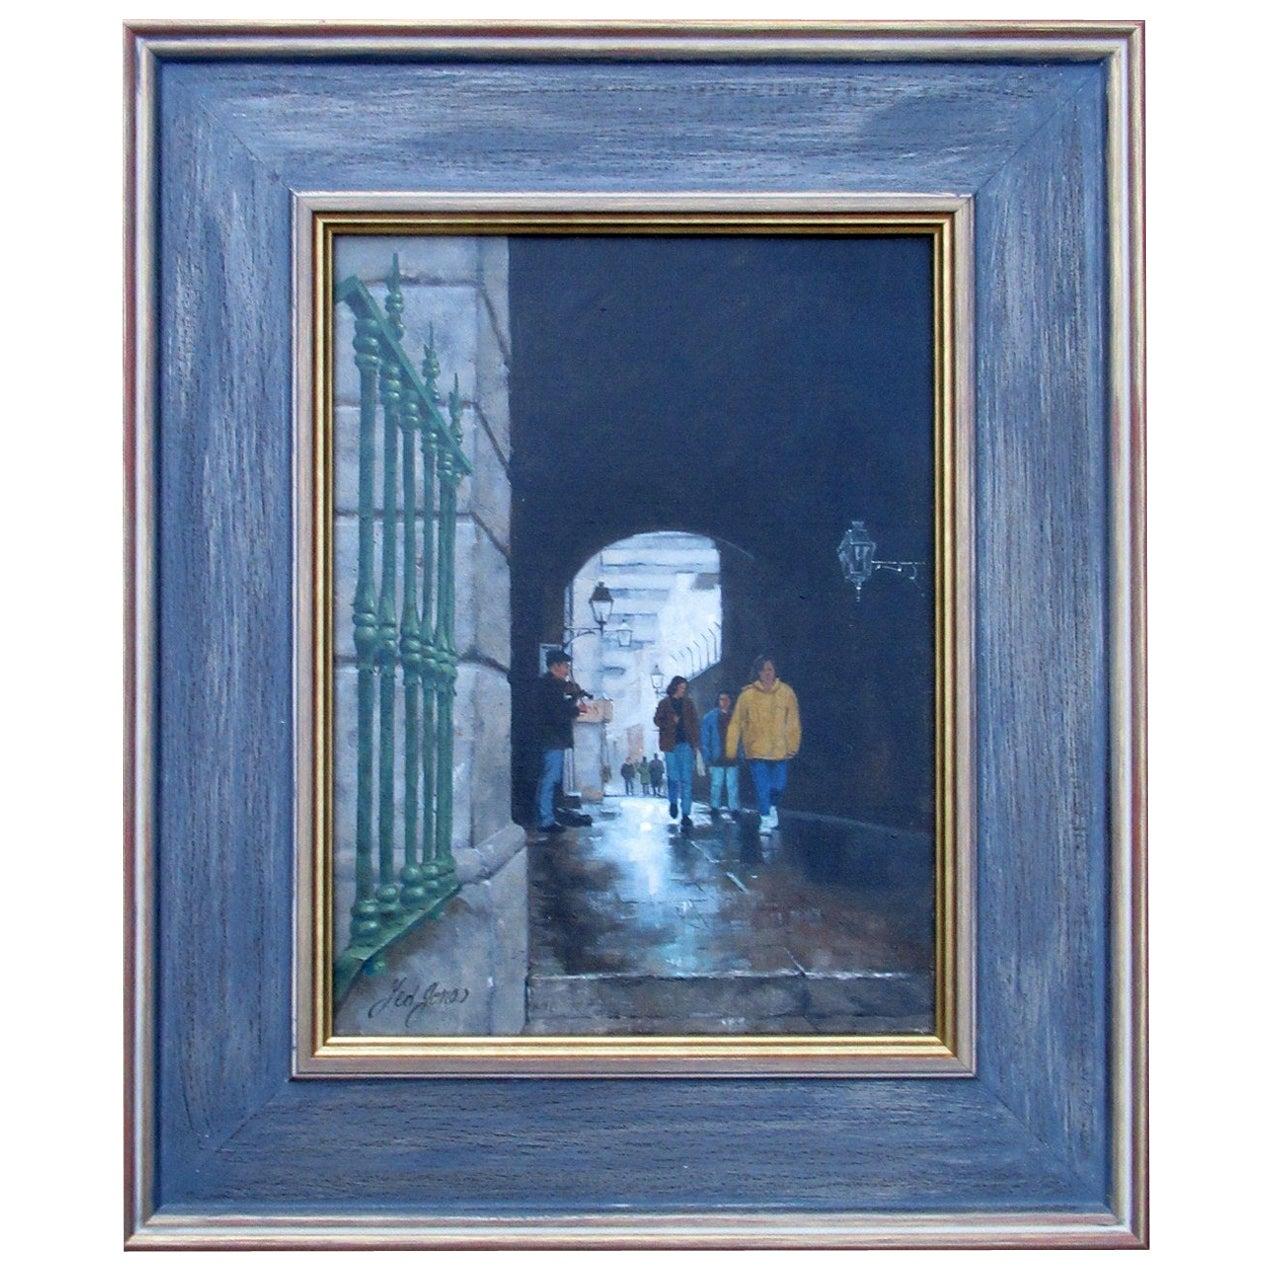 Ted Jones Dublin Ireland Irish Oil Painting on Canvas Merchants Arch City View